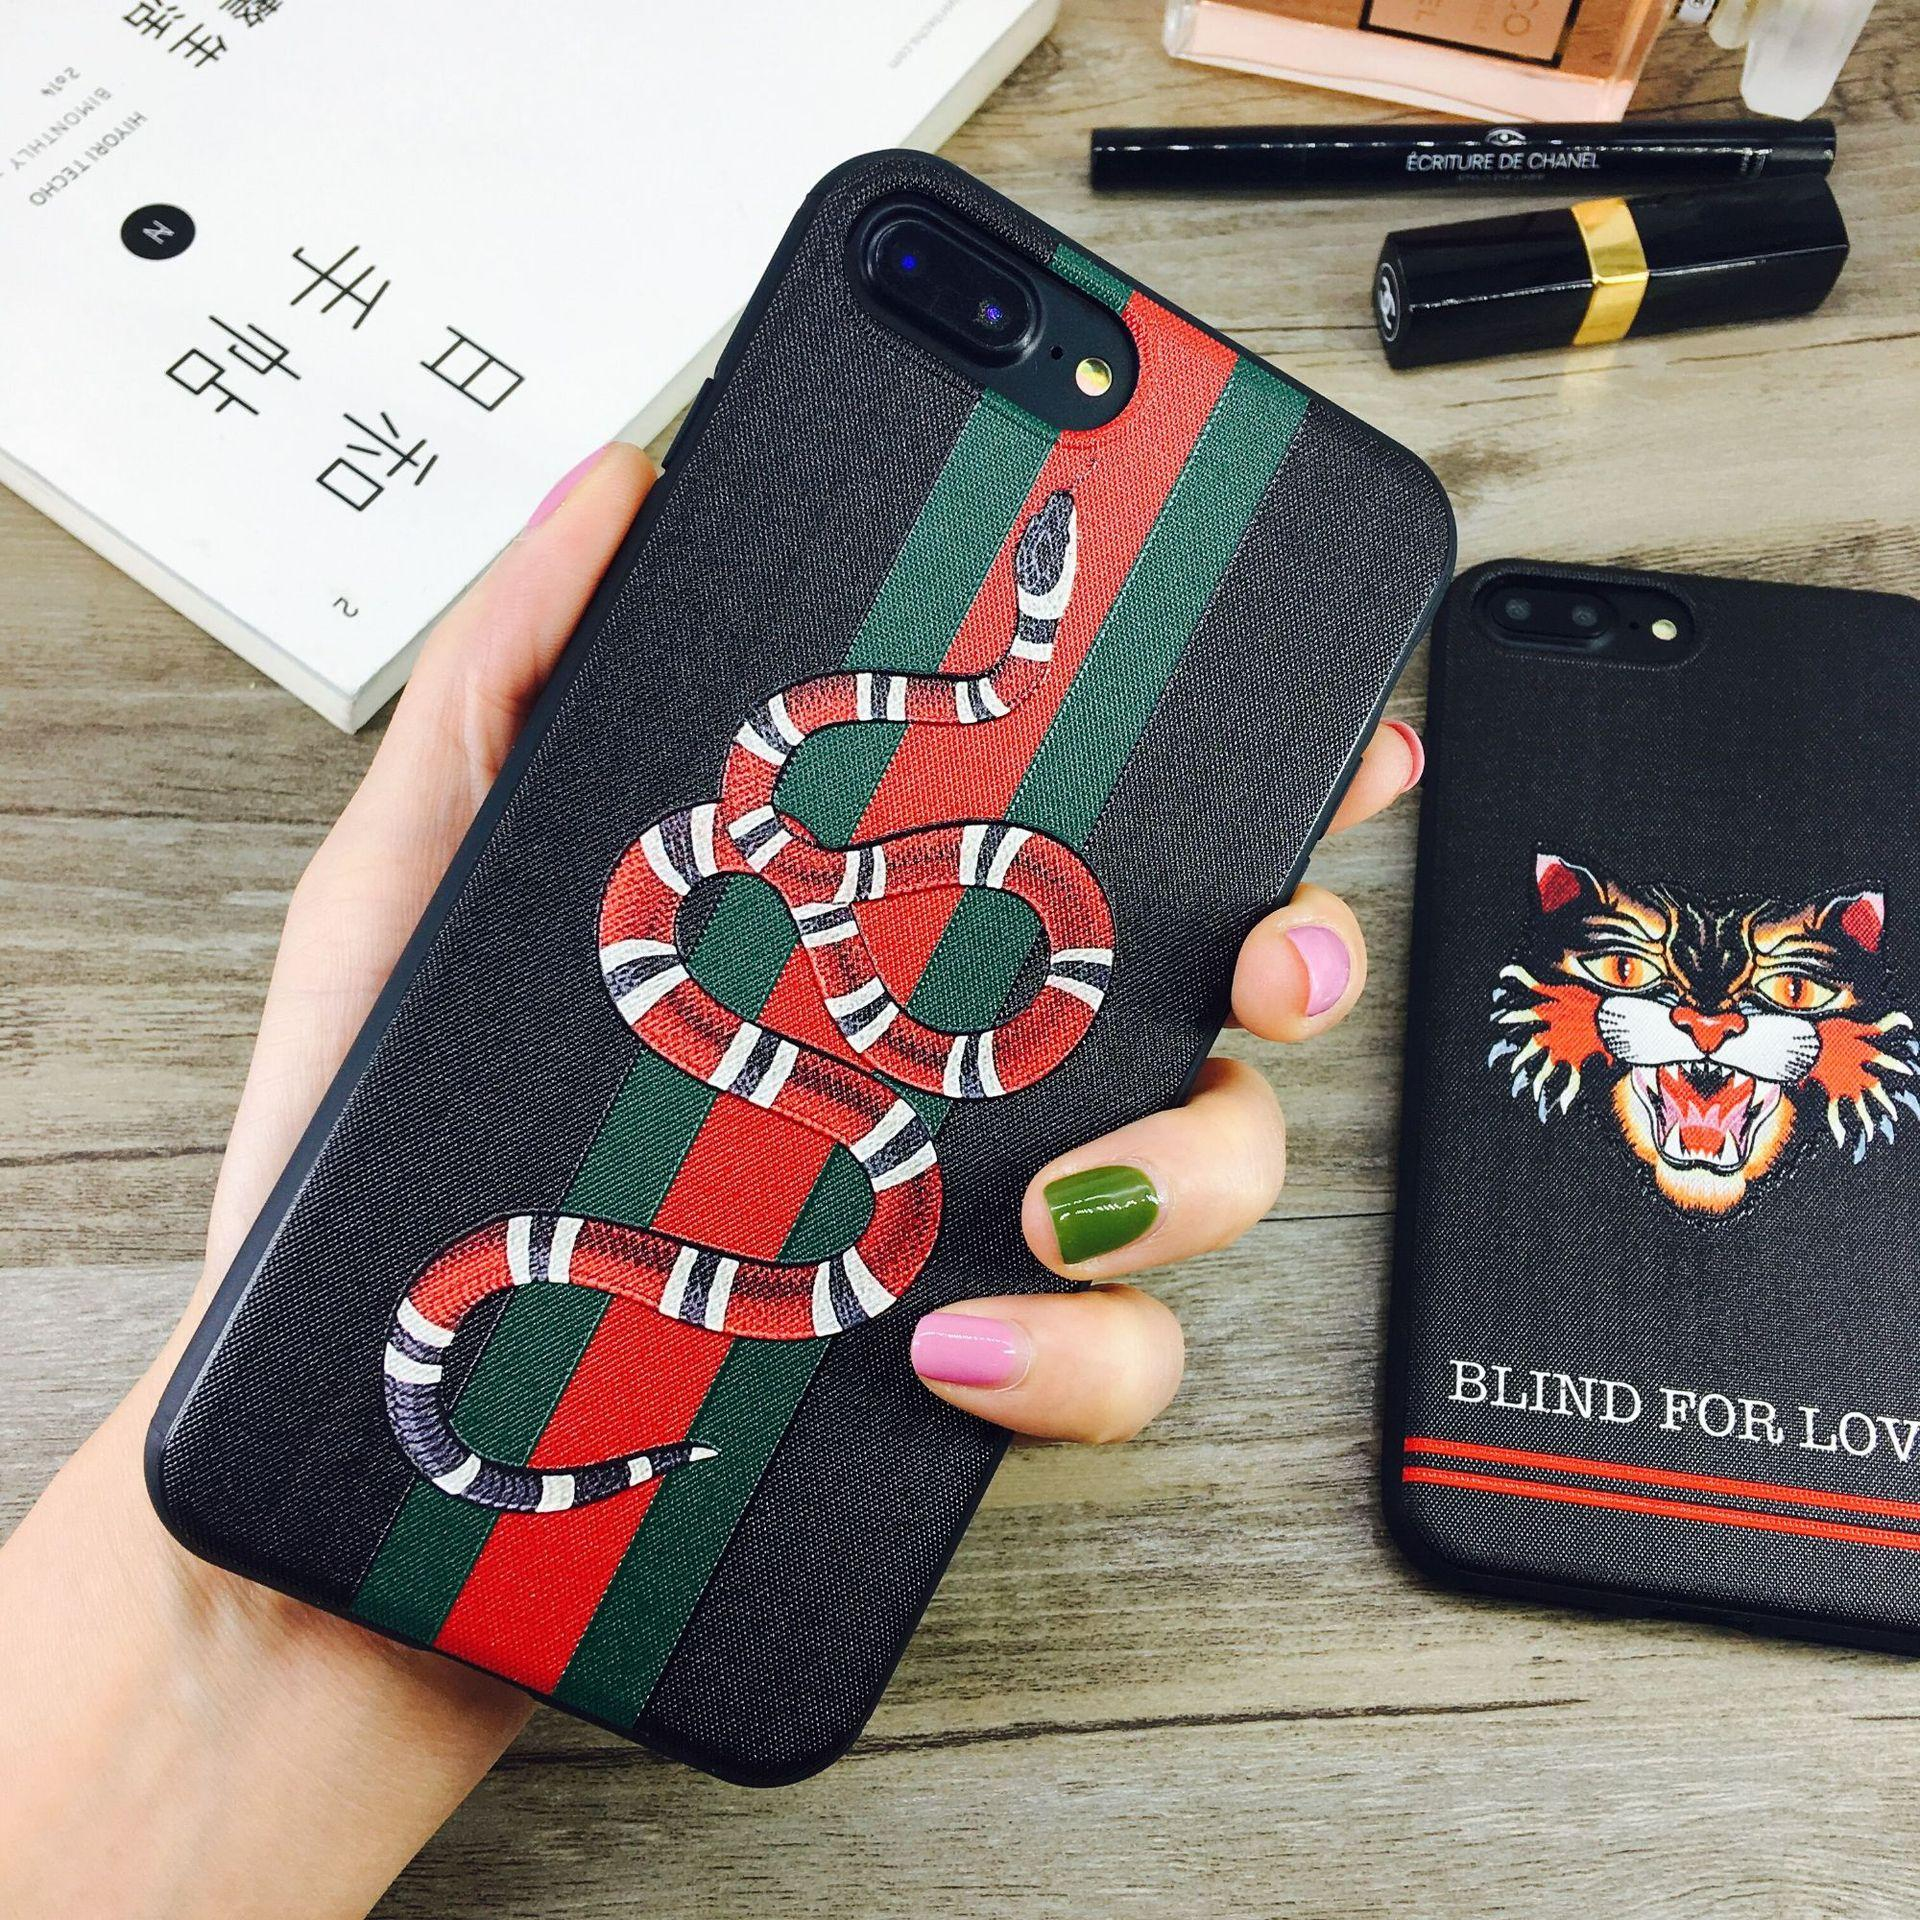 4635ba1568f3a Fashion Designer Phone Case For IPhone X 6 6S 6plus 6S Plus 7 8 7plus 8plus  Luxury Brand Case Back Cover Phone Case Protection Cell Phone Case Wallet  Cell ...